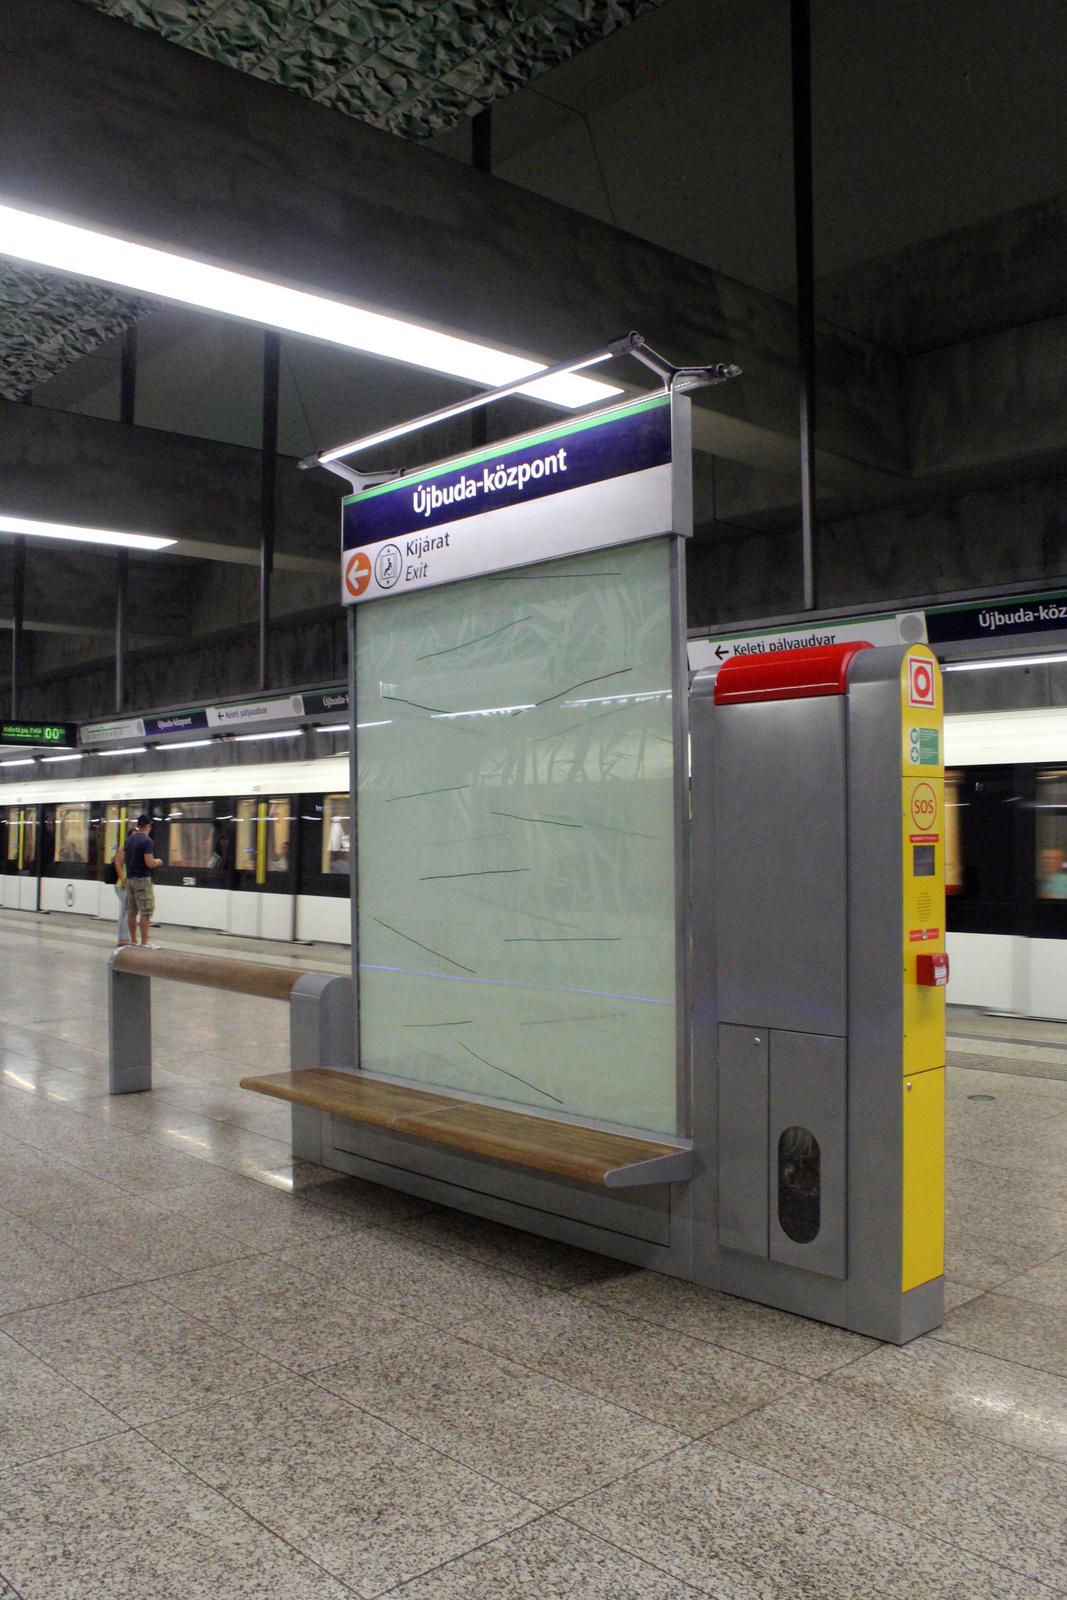 fovarosi.blog.hu: Metro4-UjbudaKozpont-20150726-15 - indafoto.hu